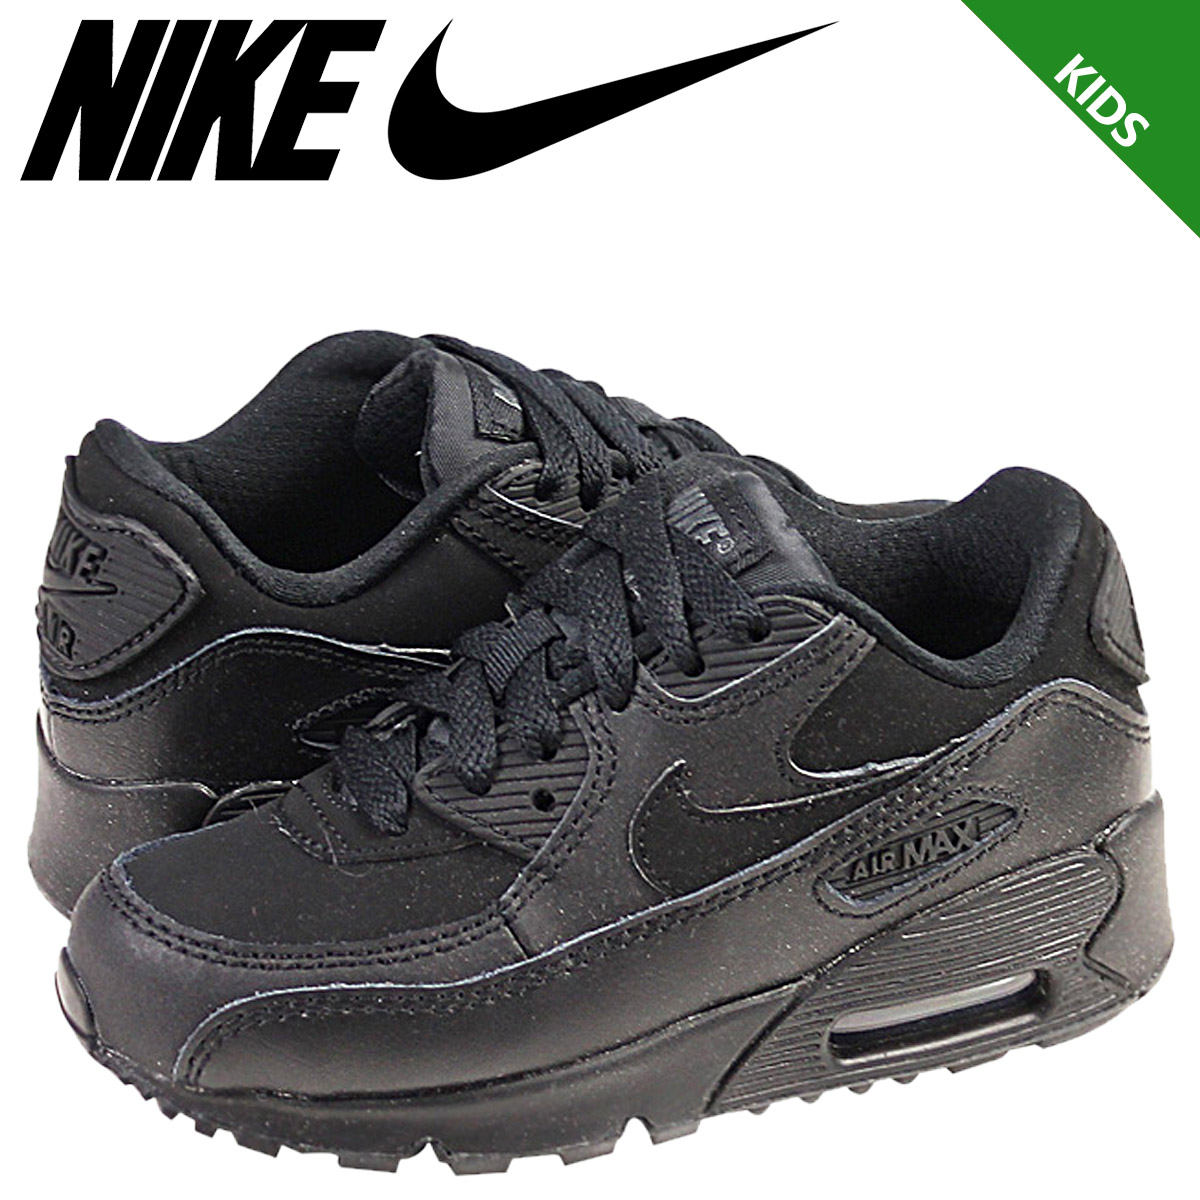 Nike Air Max 90 Ultra 2.0 SE Black White Men Running Shoes